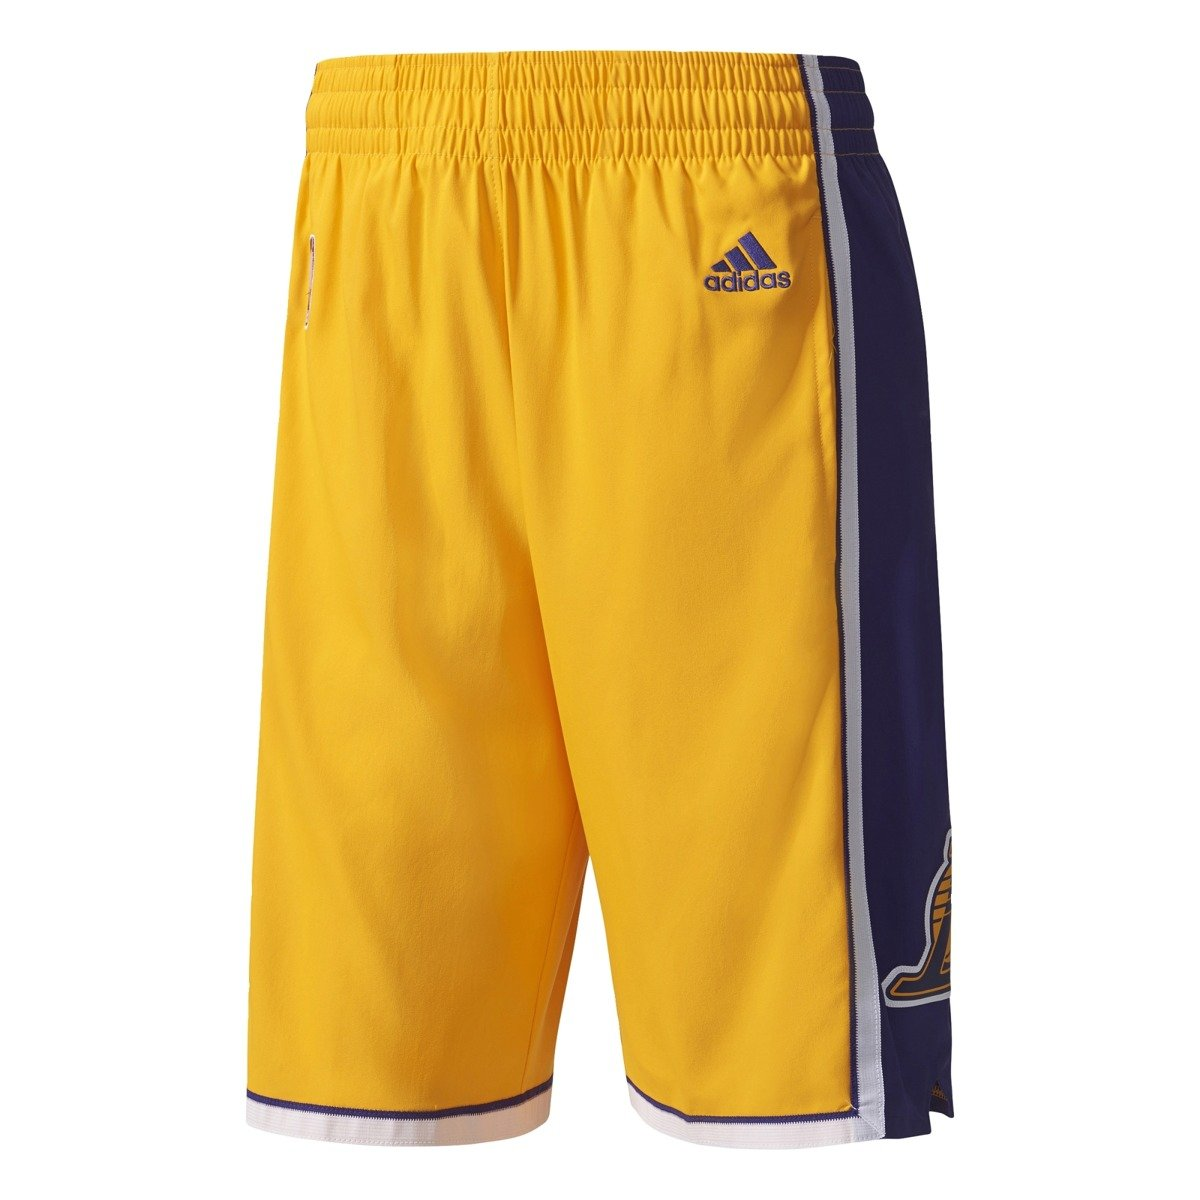 ... Adidas NBA Los Angeles Lakers Swingman Basketball Shorts - A20641 ...